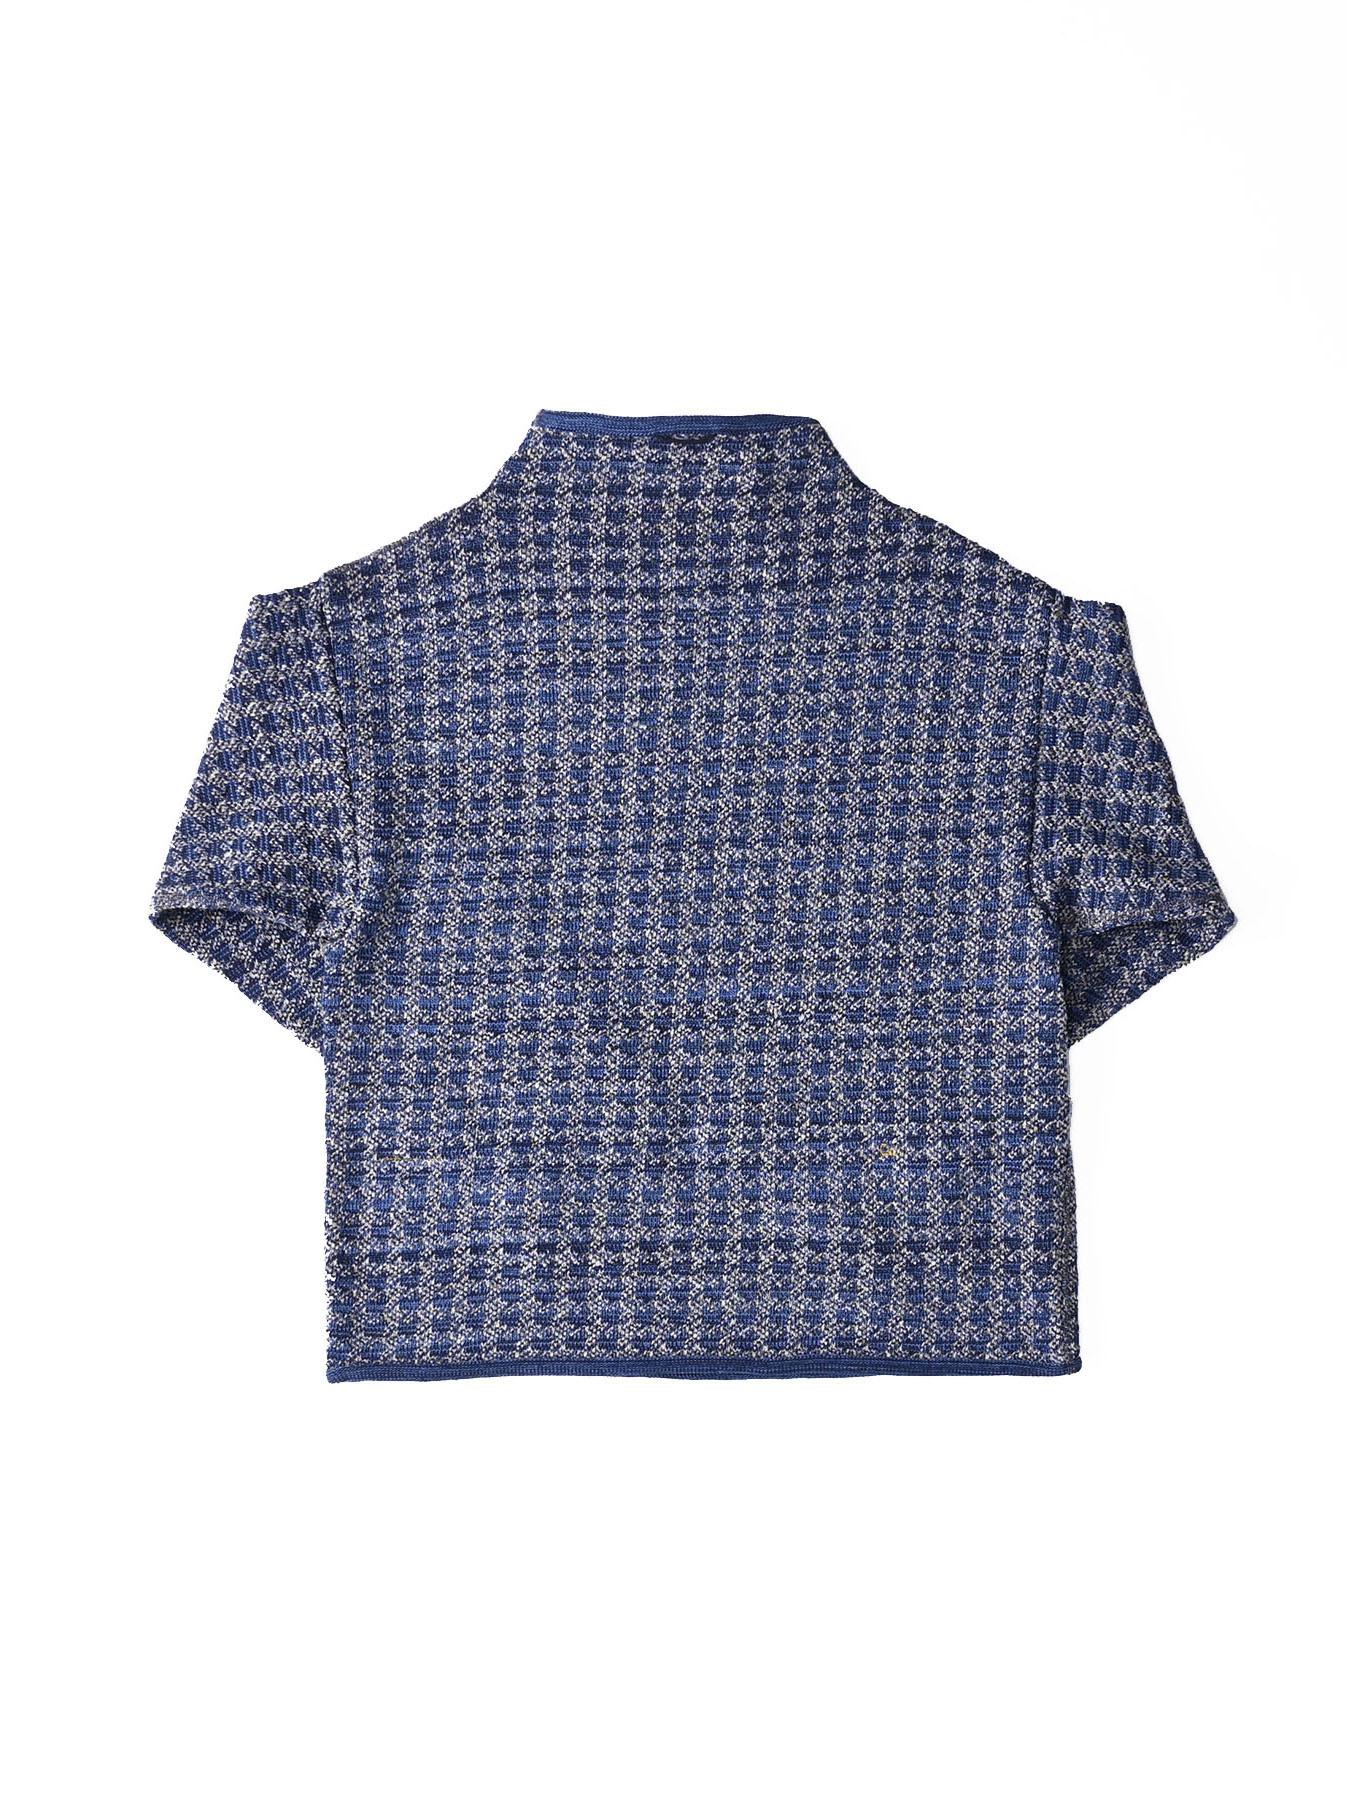 Indigo Knit Jacquard 908 Umahiko Sweater-6